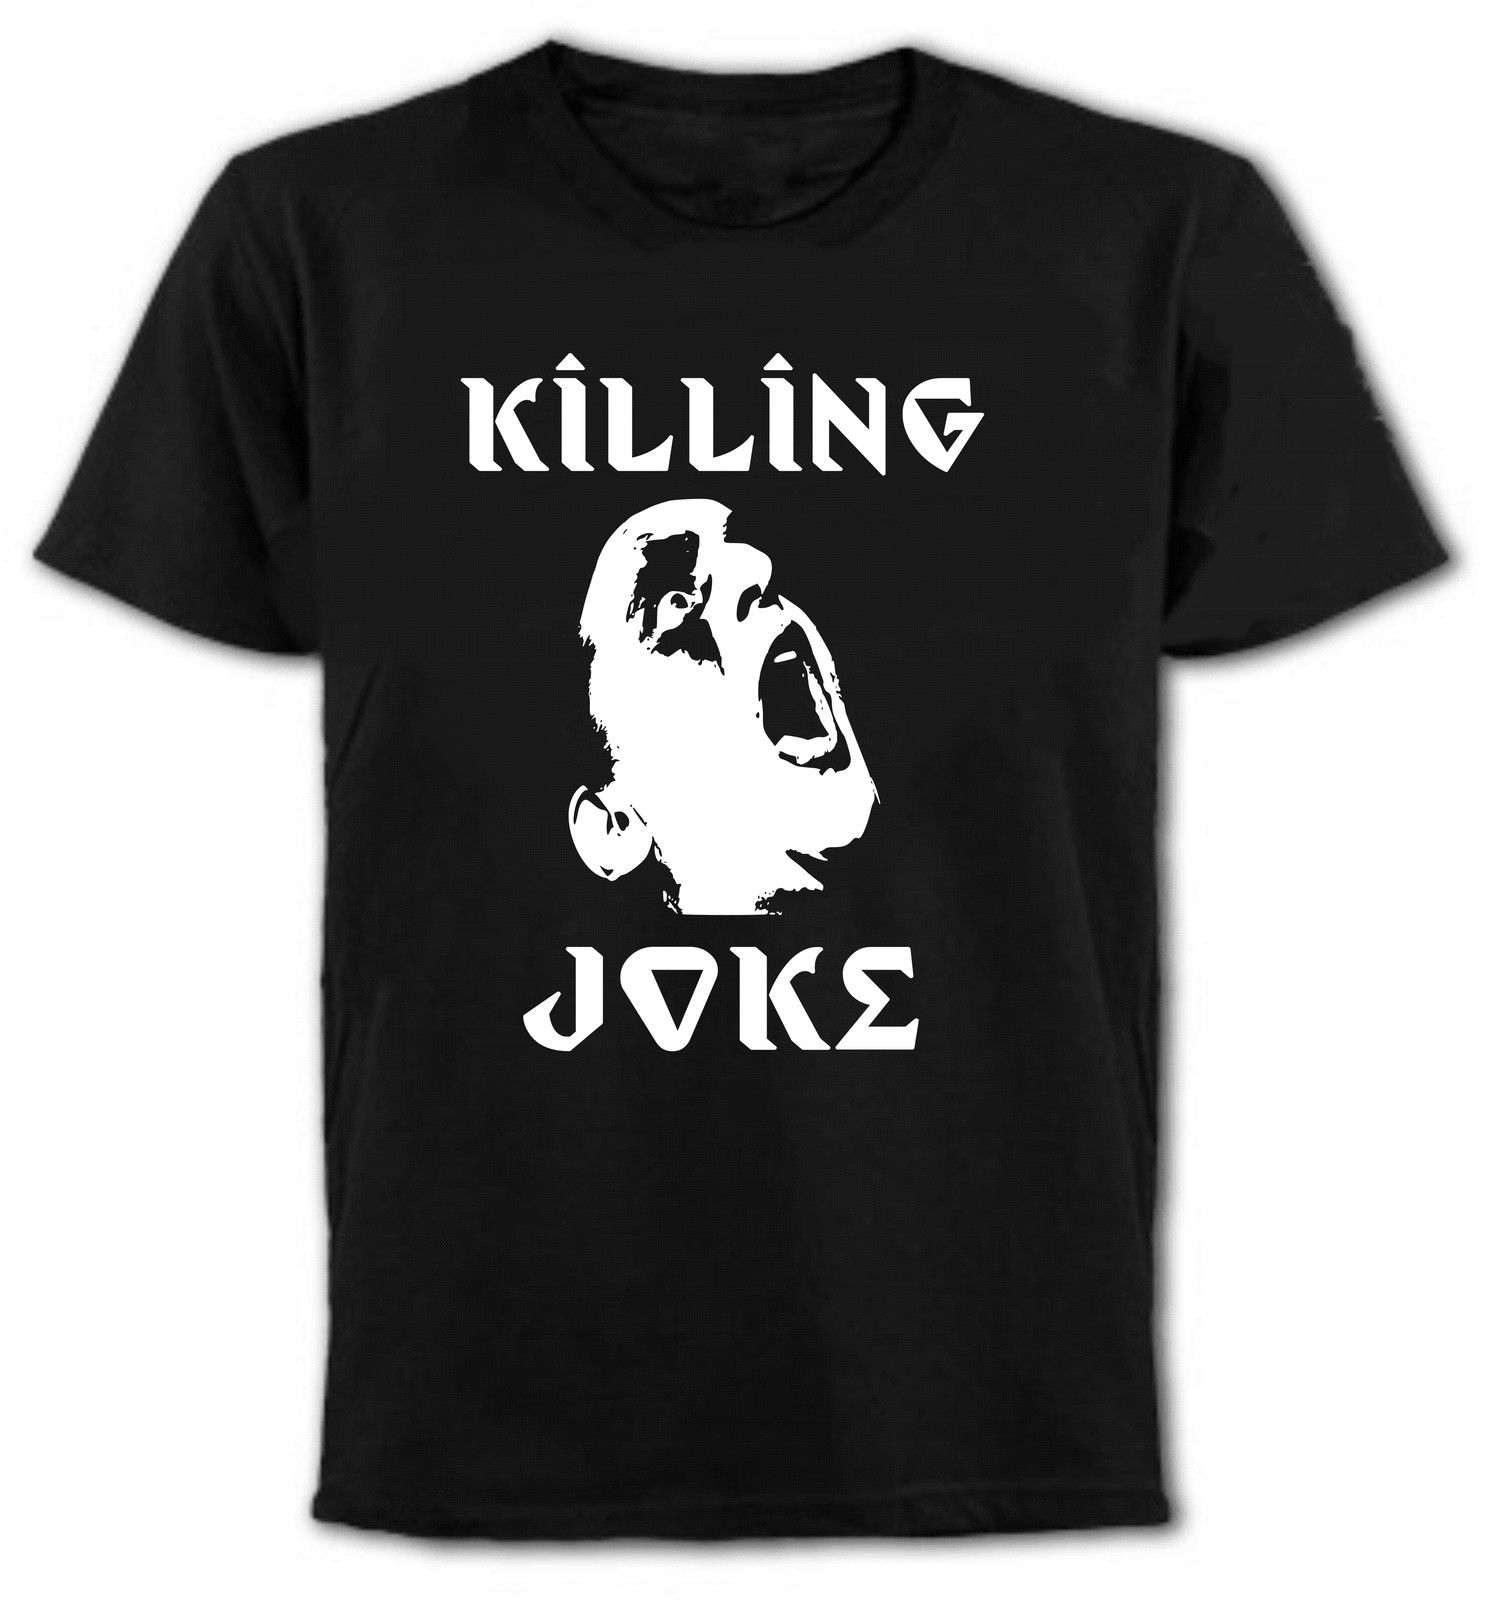 New Killing Joke *Pylon English Punk Rock Band Mens Black T-Shirt Size S To 3XL New Design Cotton Male T Shirt Designing